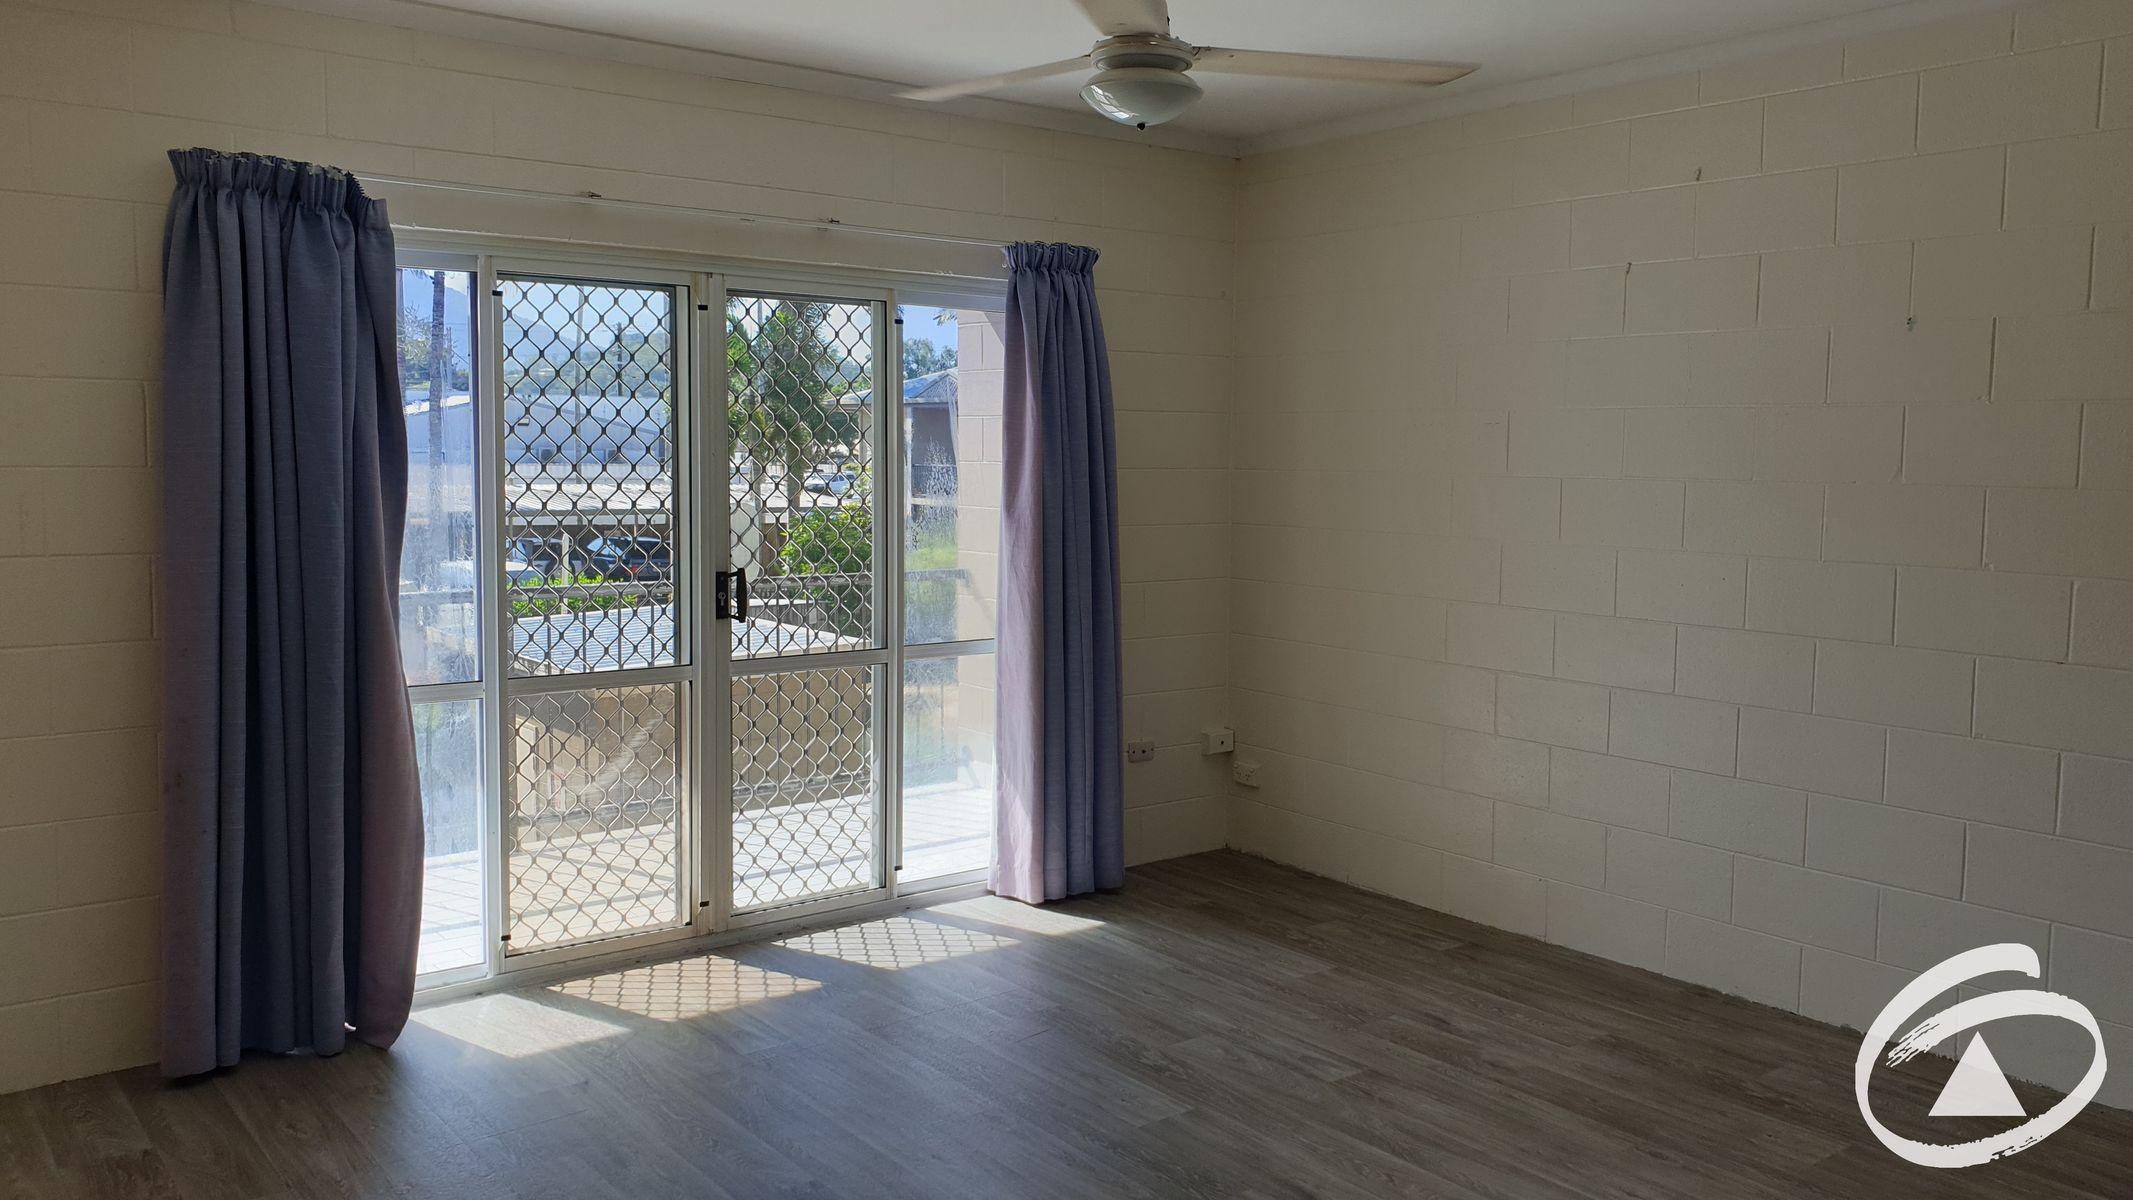 29/52 Pease Street, Manoora, QLD 4870